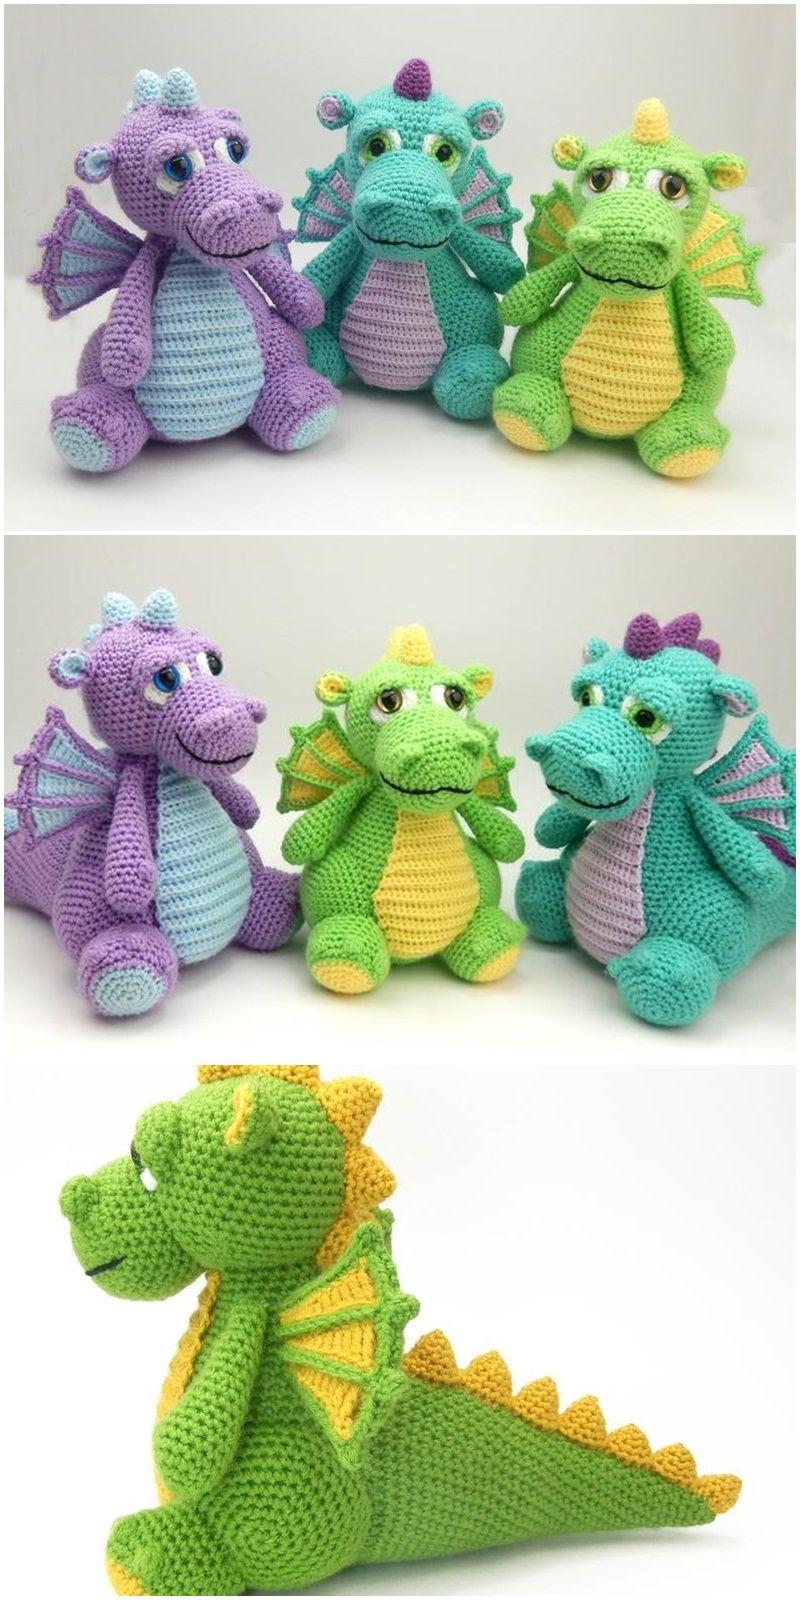 Free Amigurumi Dolls Crochet Patterns - Amigurumi #crochetdinosaurpatterns